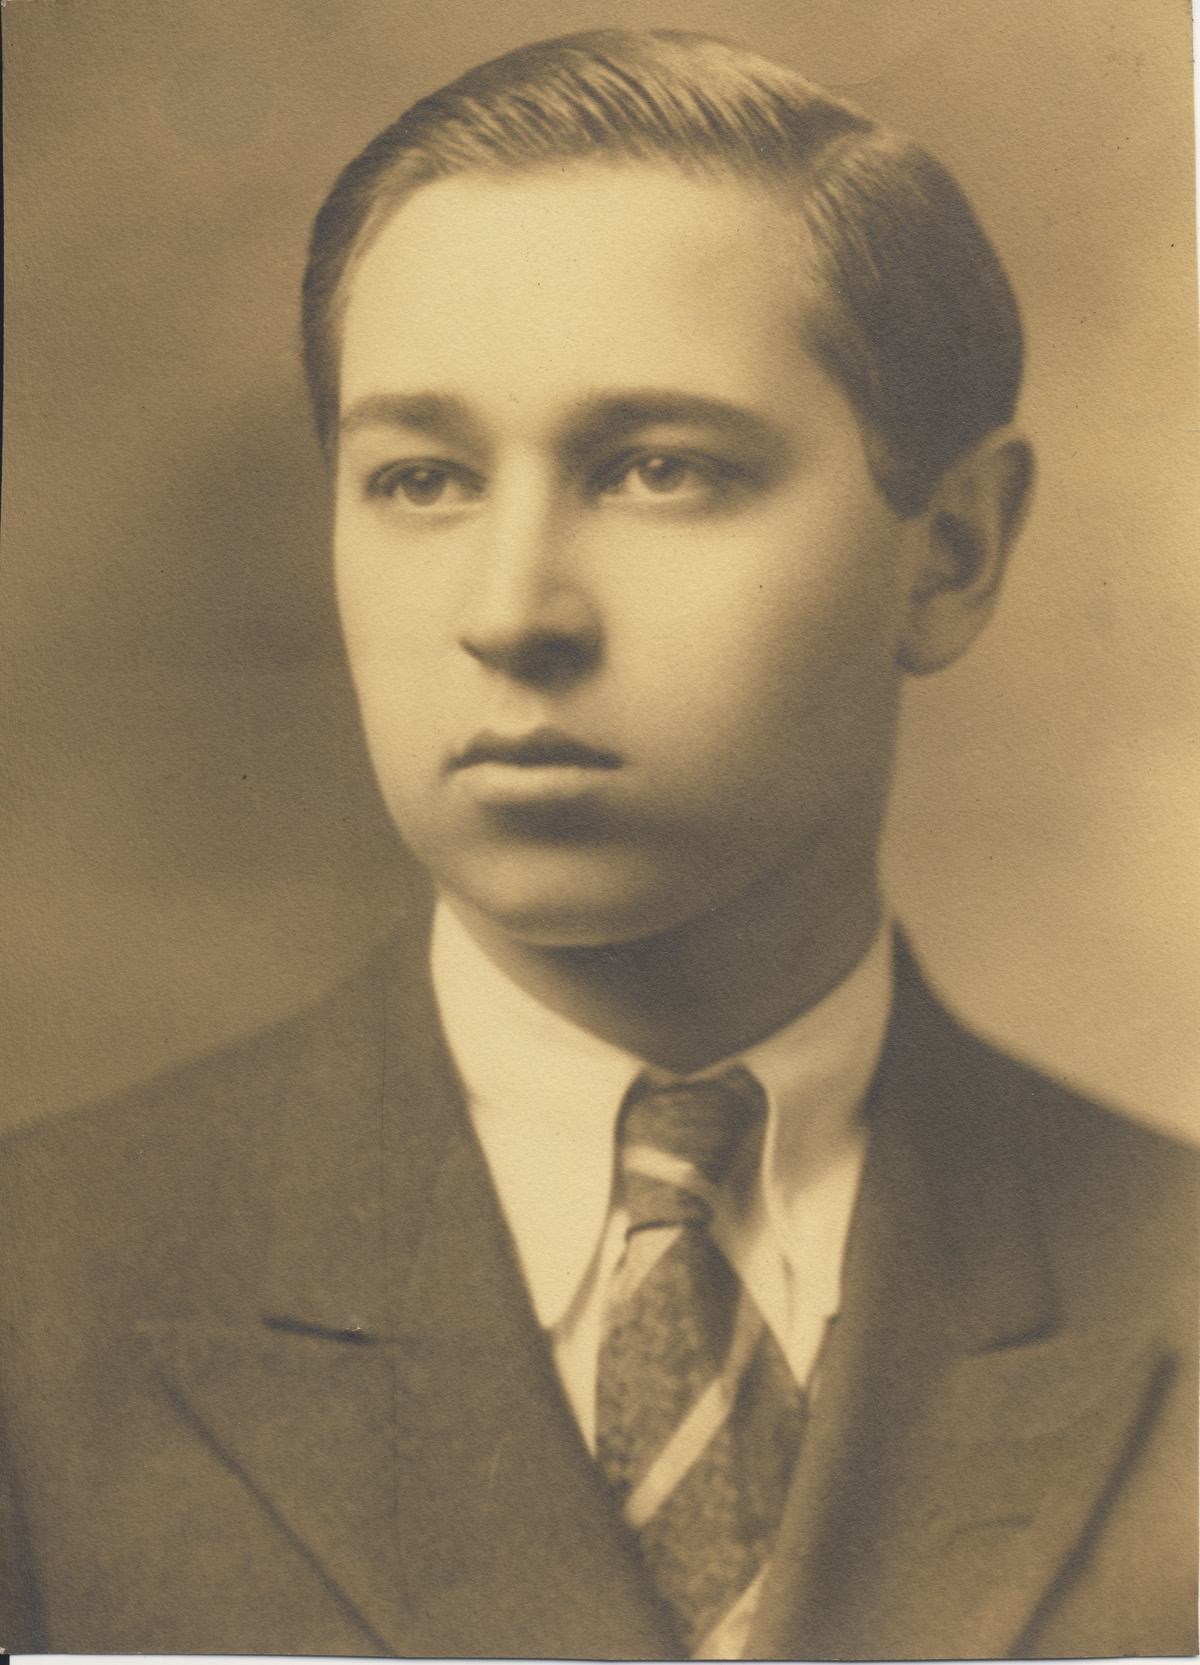 Henry Katzman Wikipedia